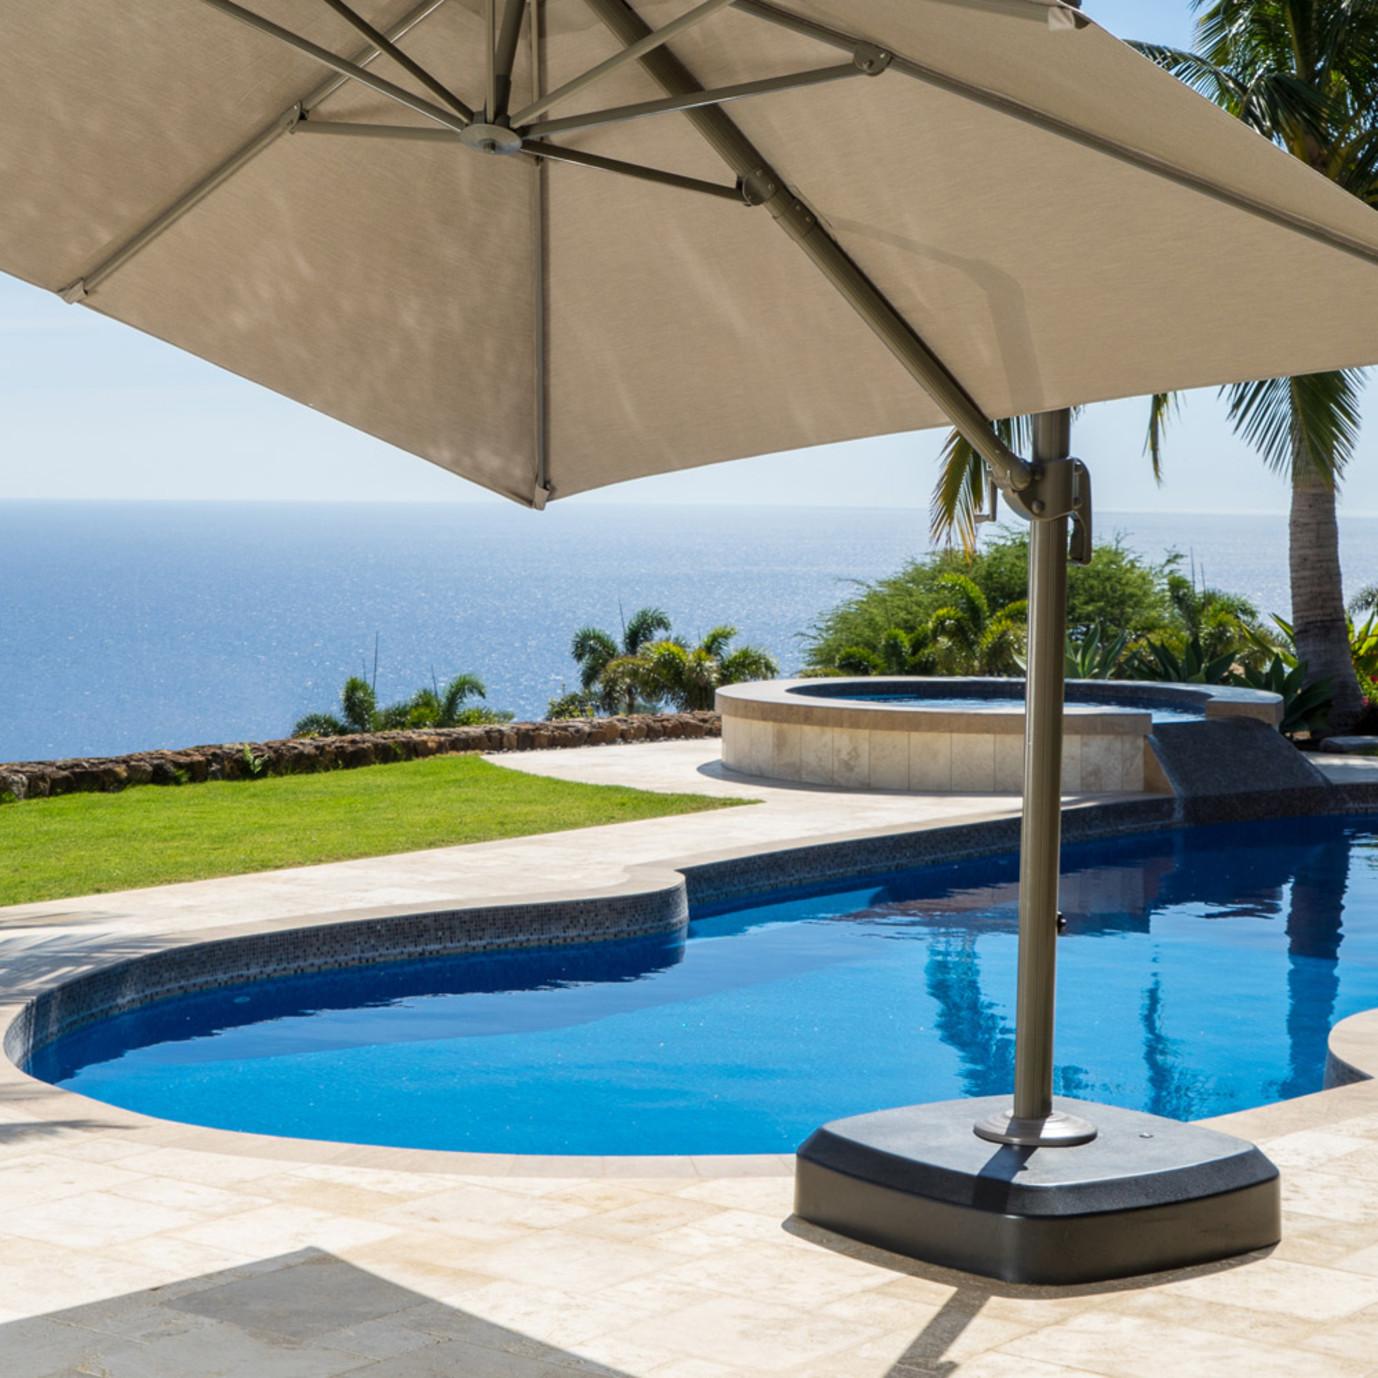 Portofino® Comfort Umbrella Base with Foot Pedal